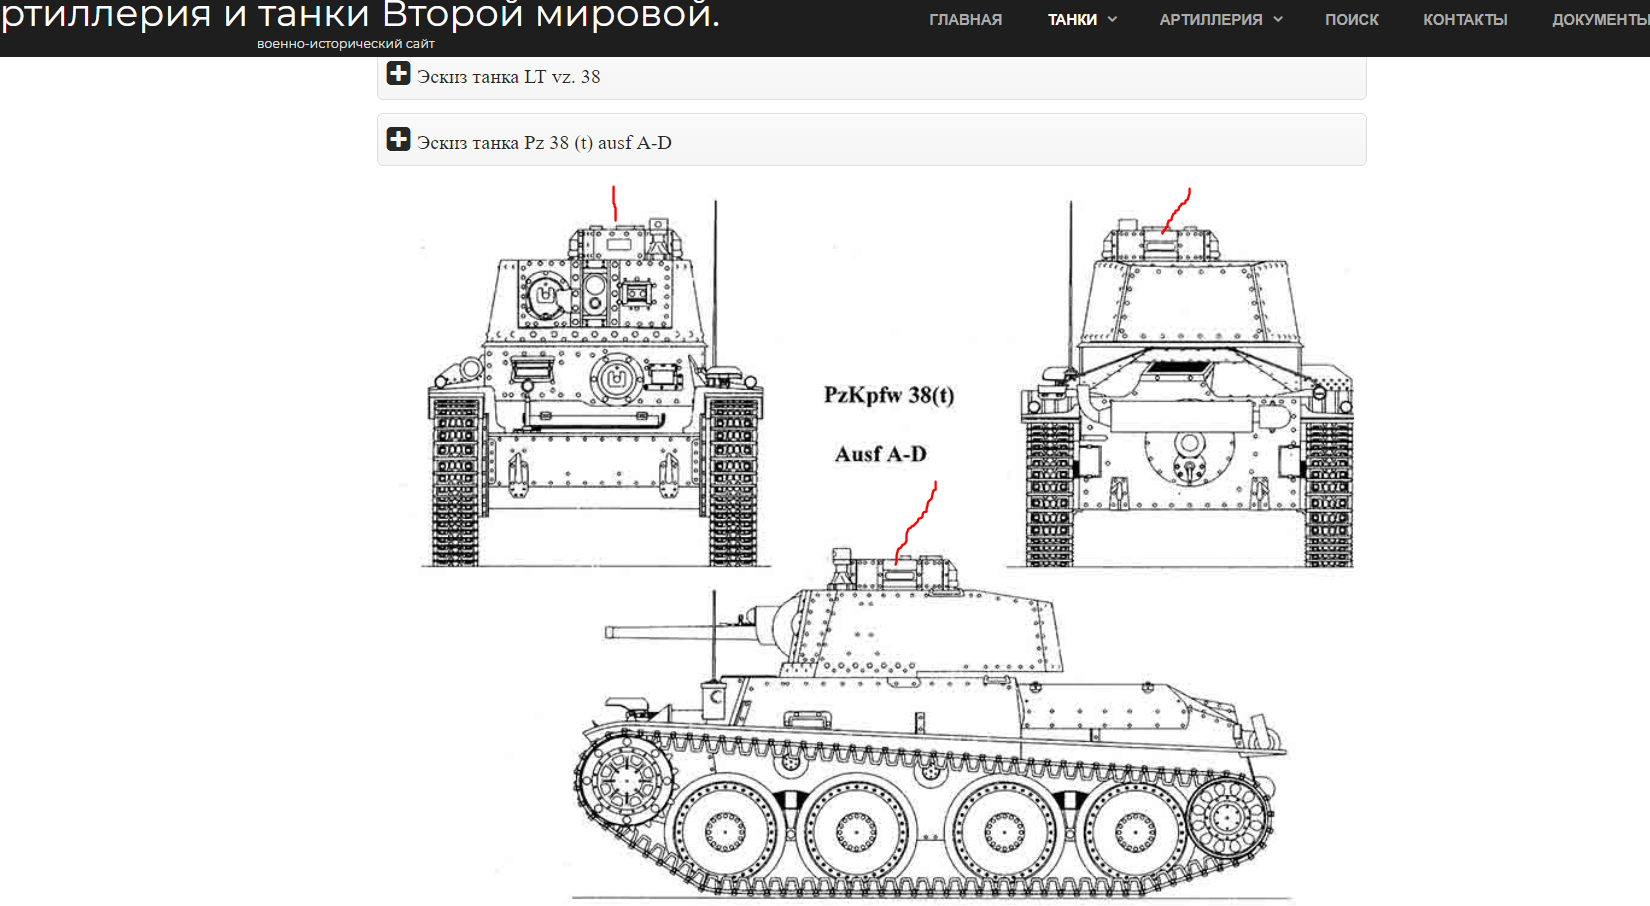 https://images.vfl.ru/ii/1551436553/413c6dab/25593832.png